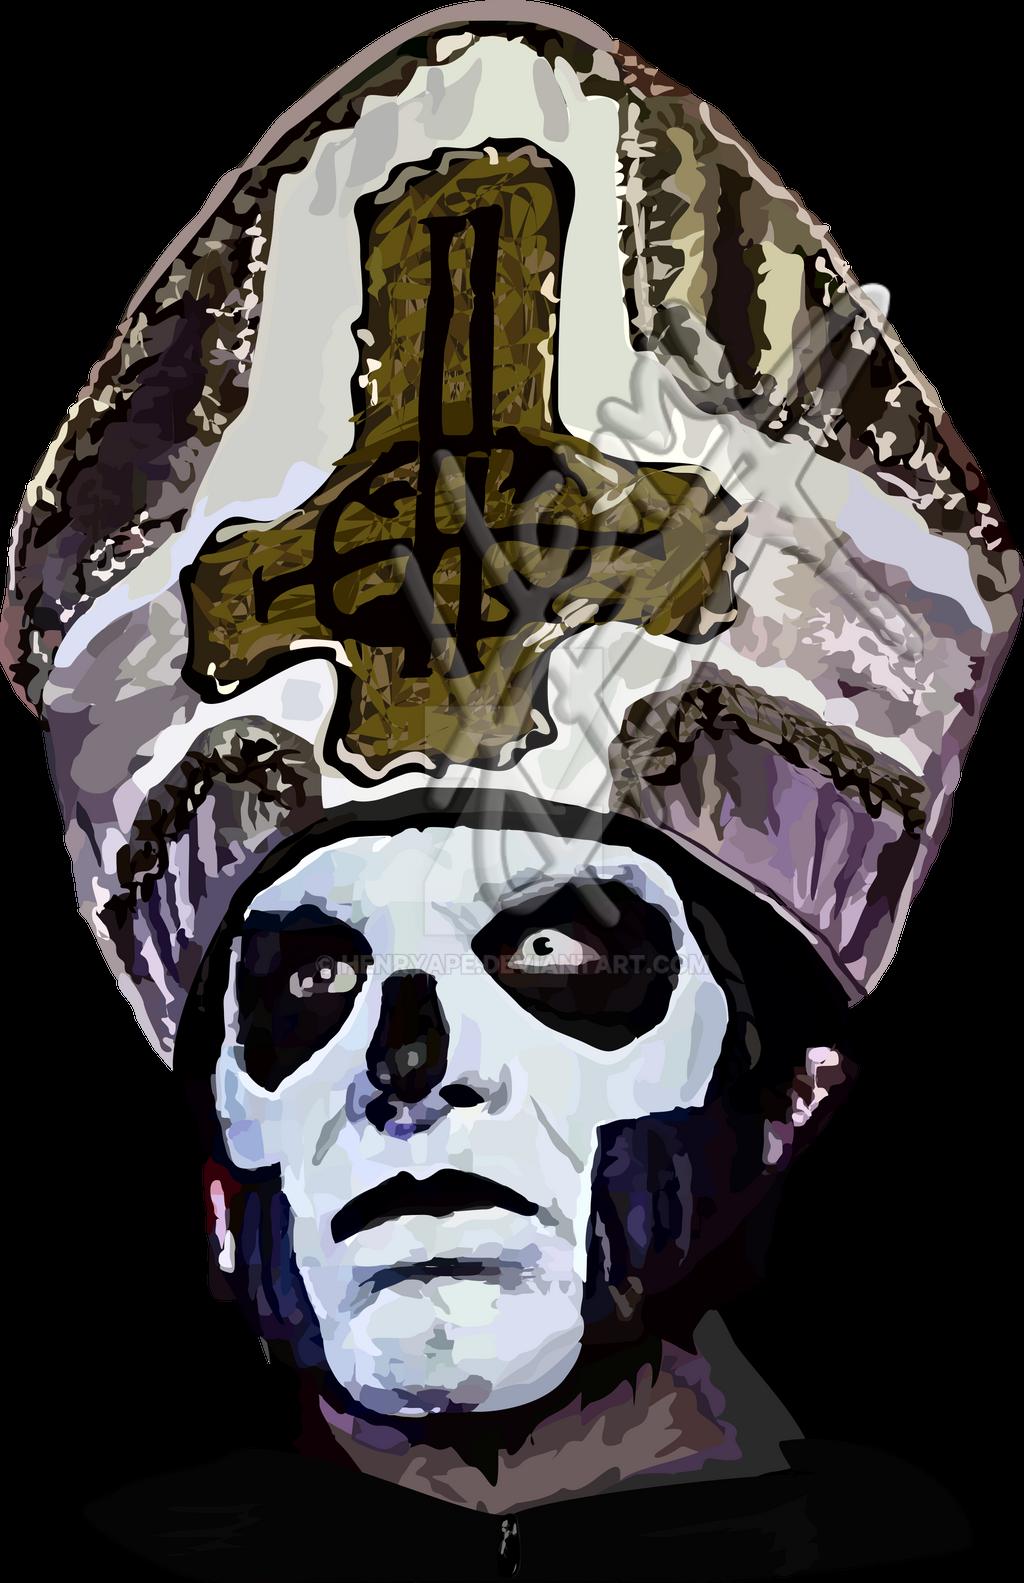 Realistic Illustration Papa Emeritus Iii By Henryape On